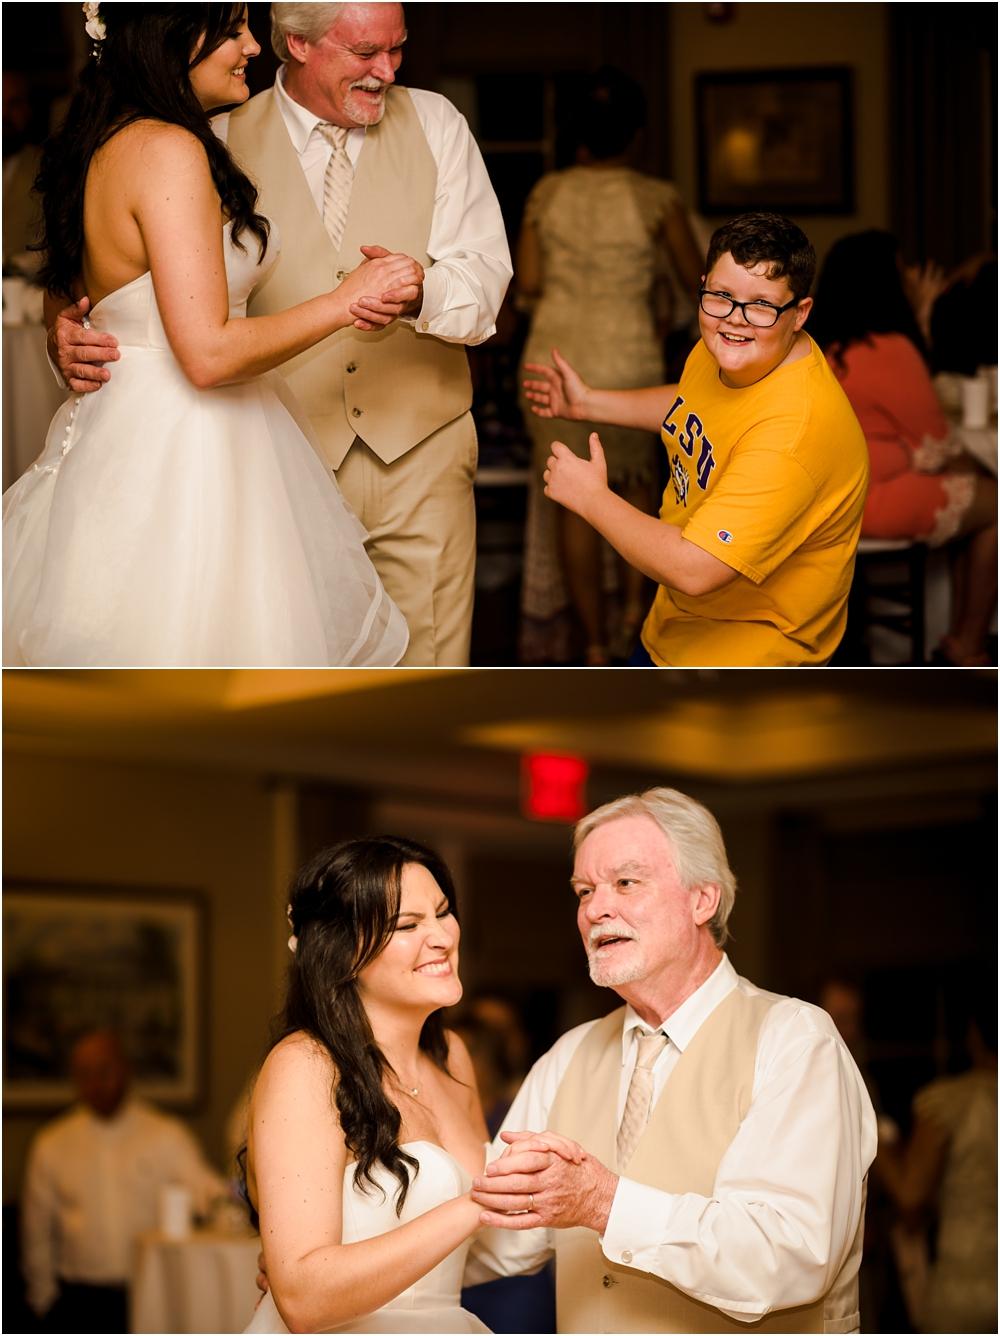 pensacola-wedding-photographer-kiersten-grant-143.jpg